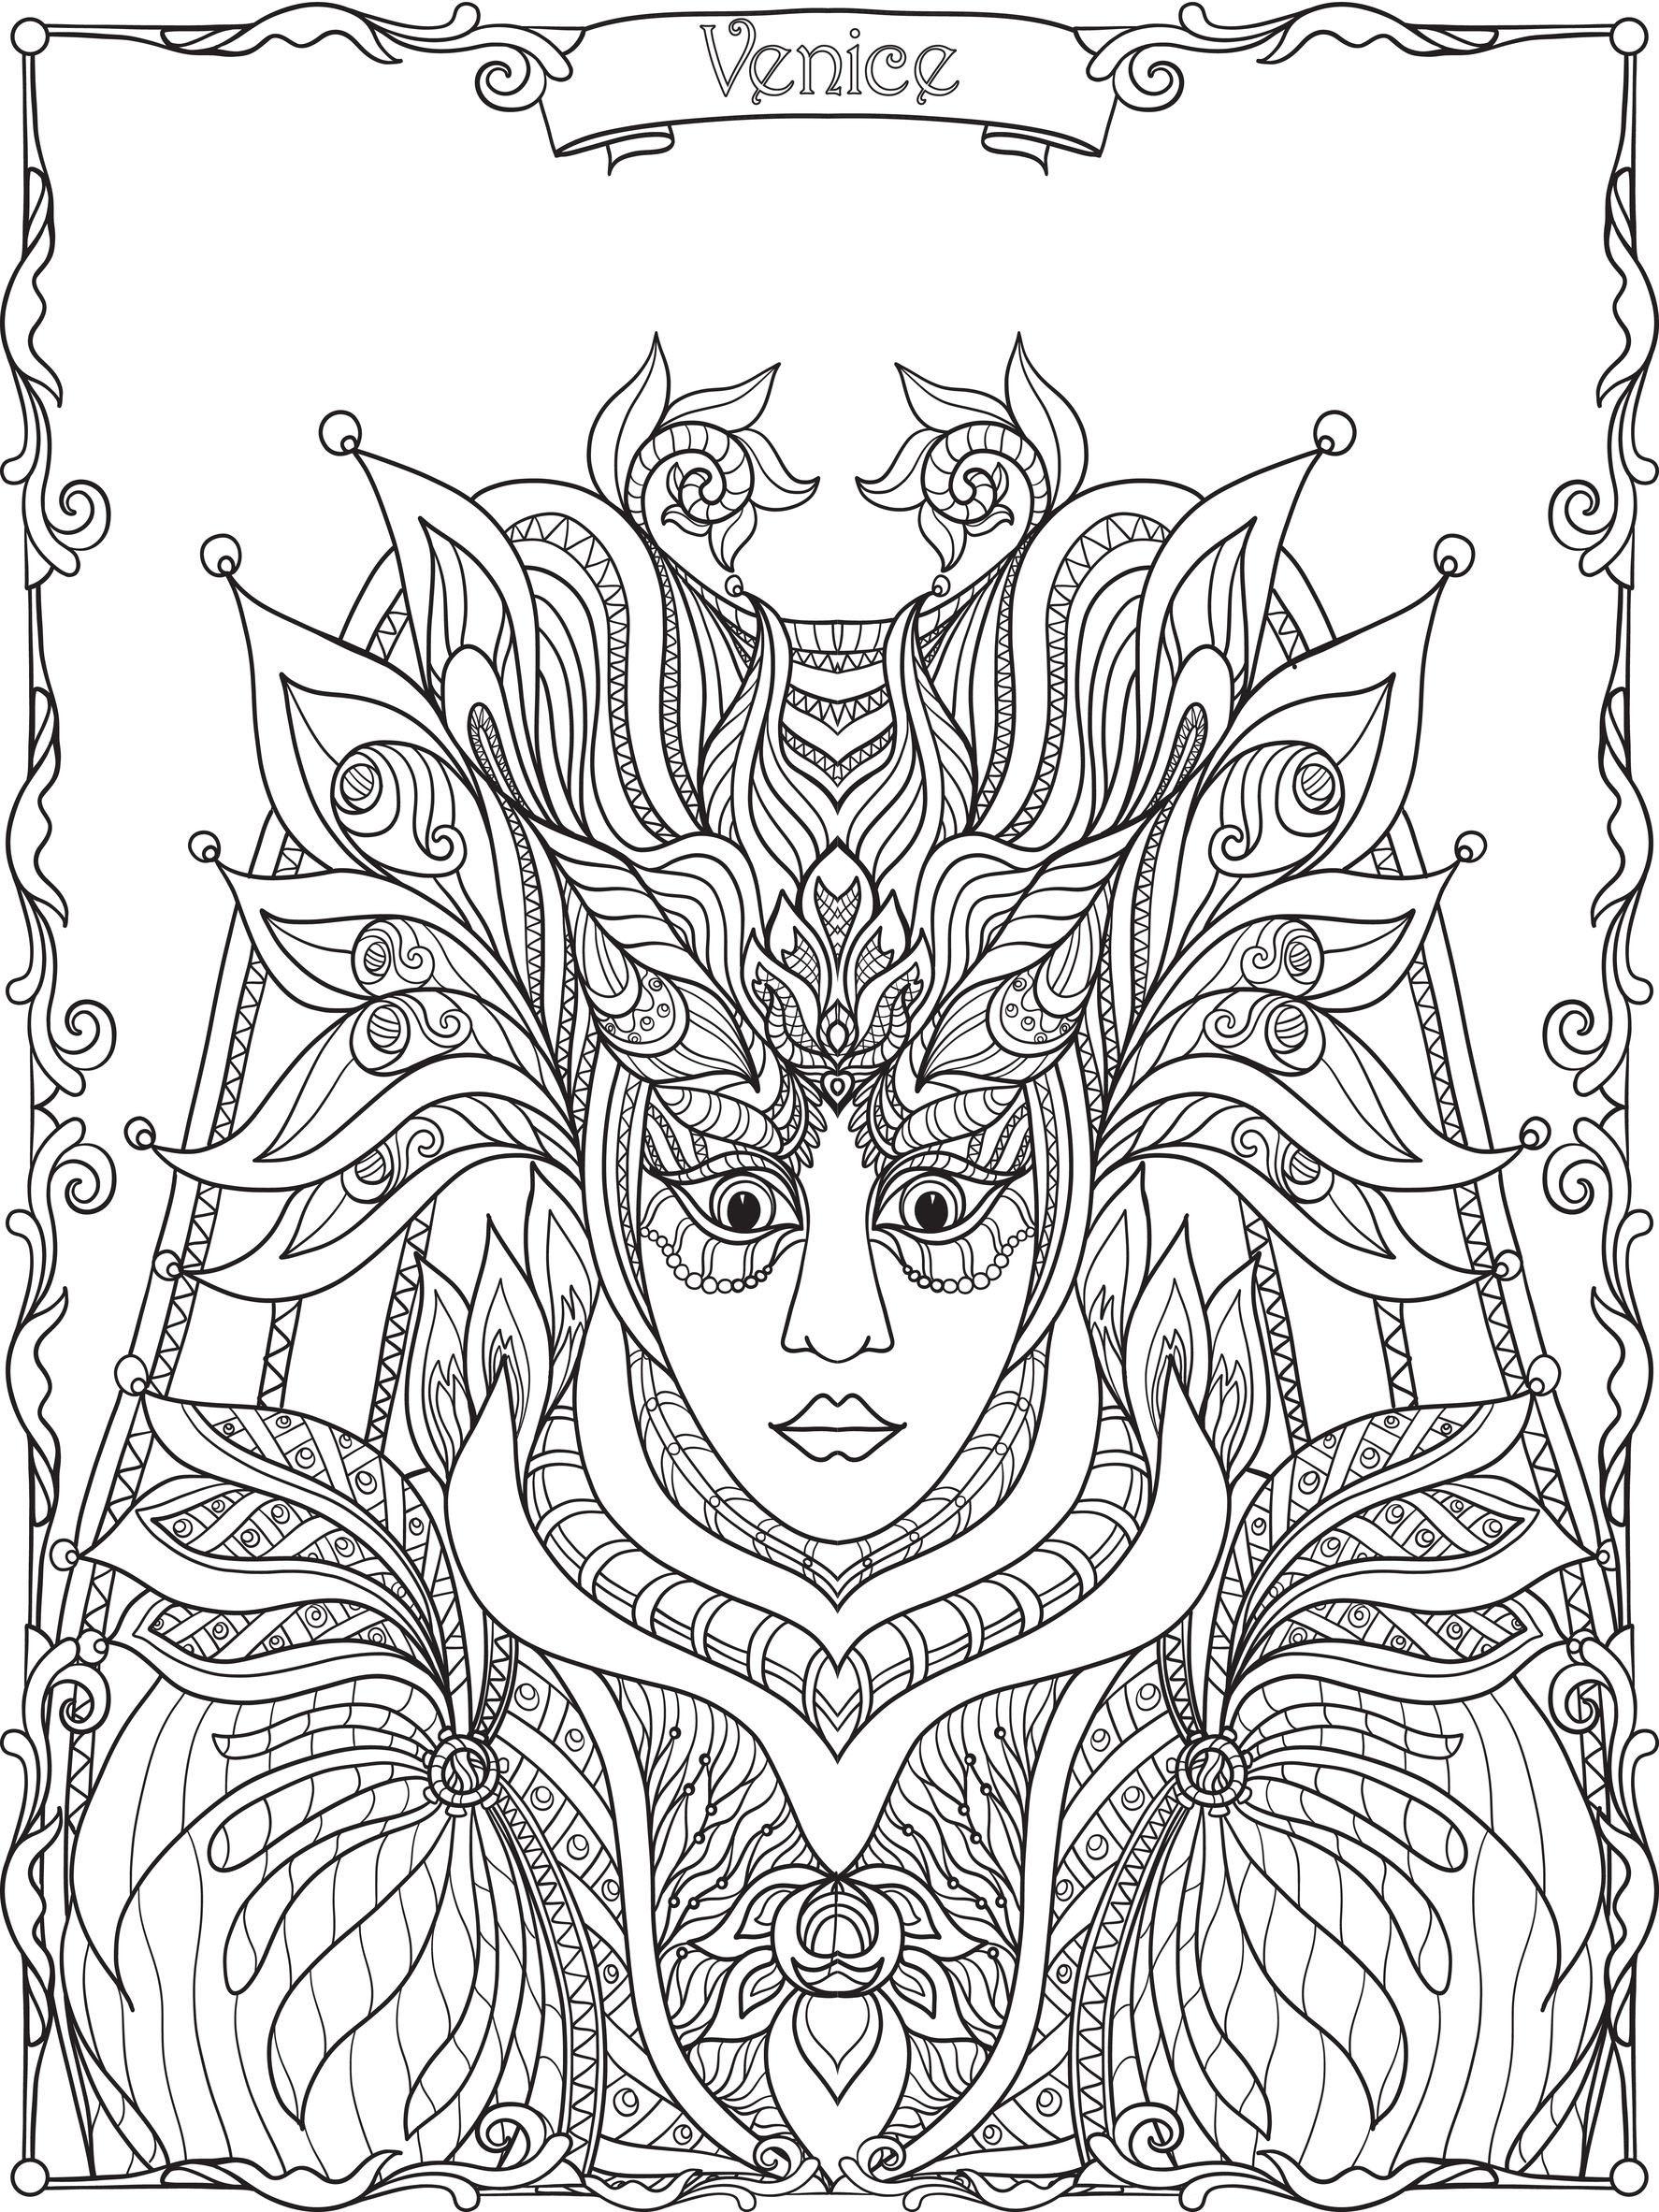 Venetian Carnival Costume and Mask